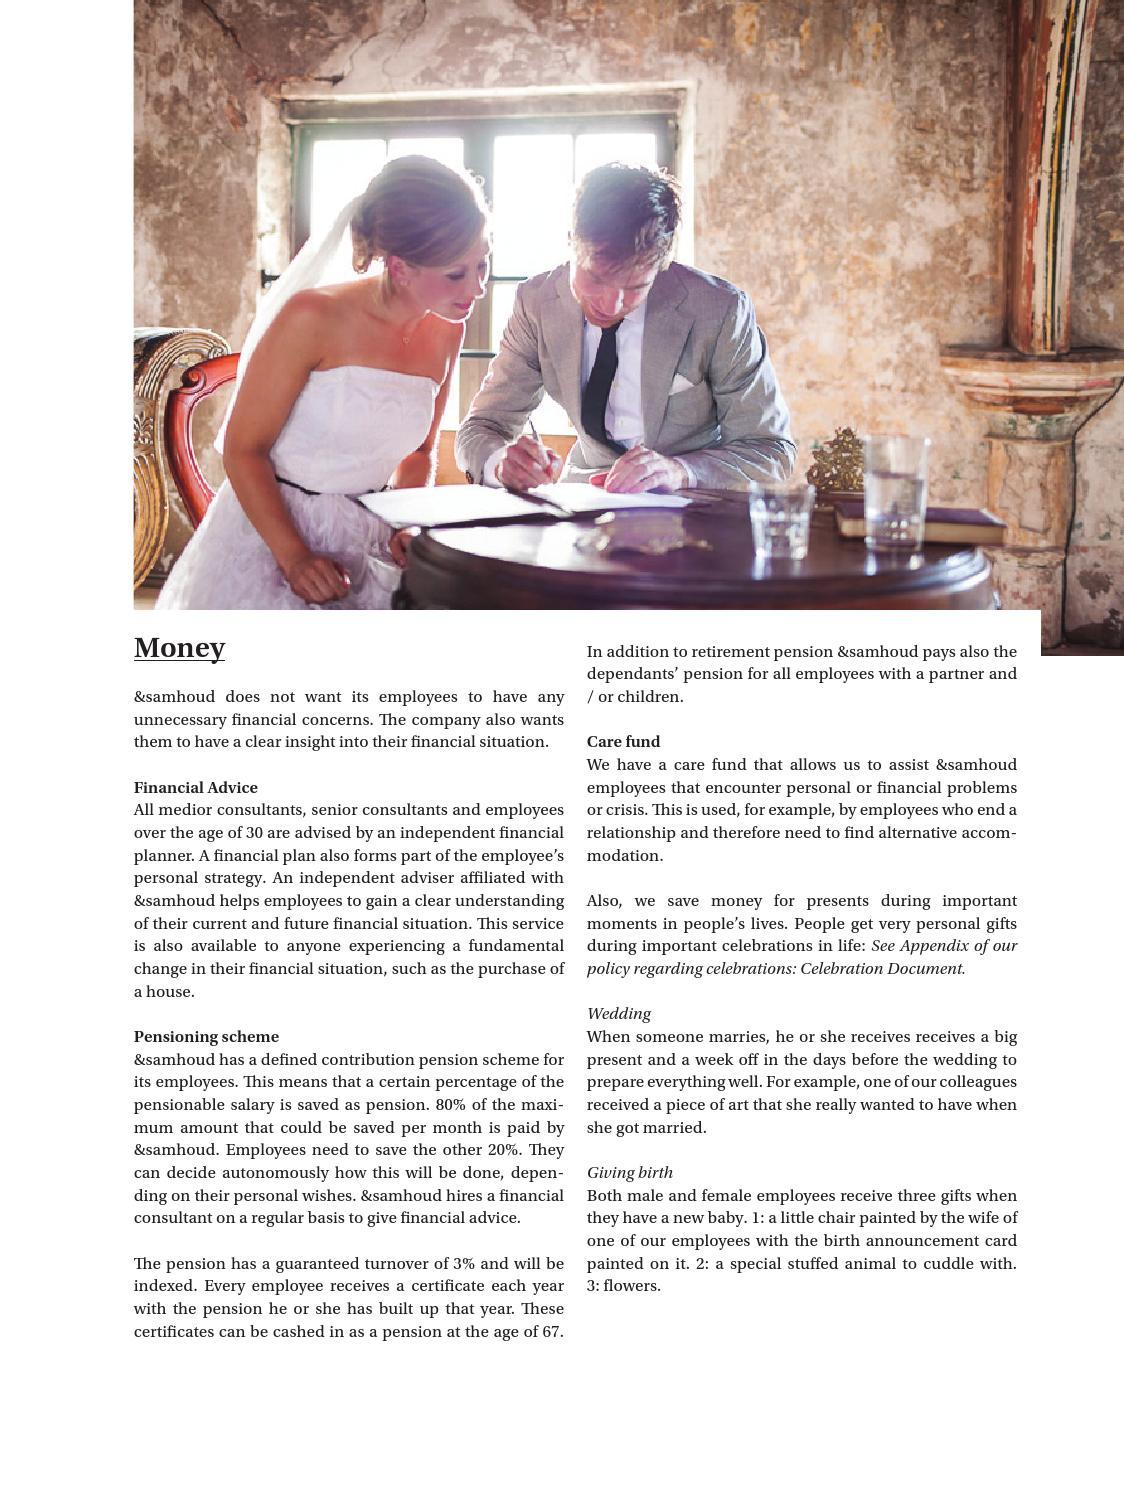 &samhoud Great Place to Work Magazine by &samhoud - issuu